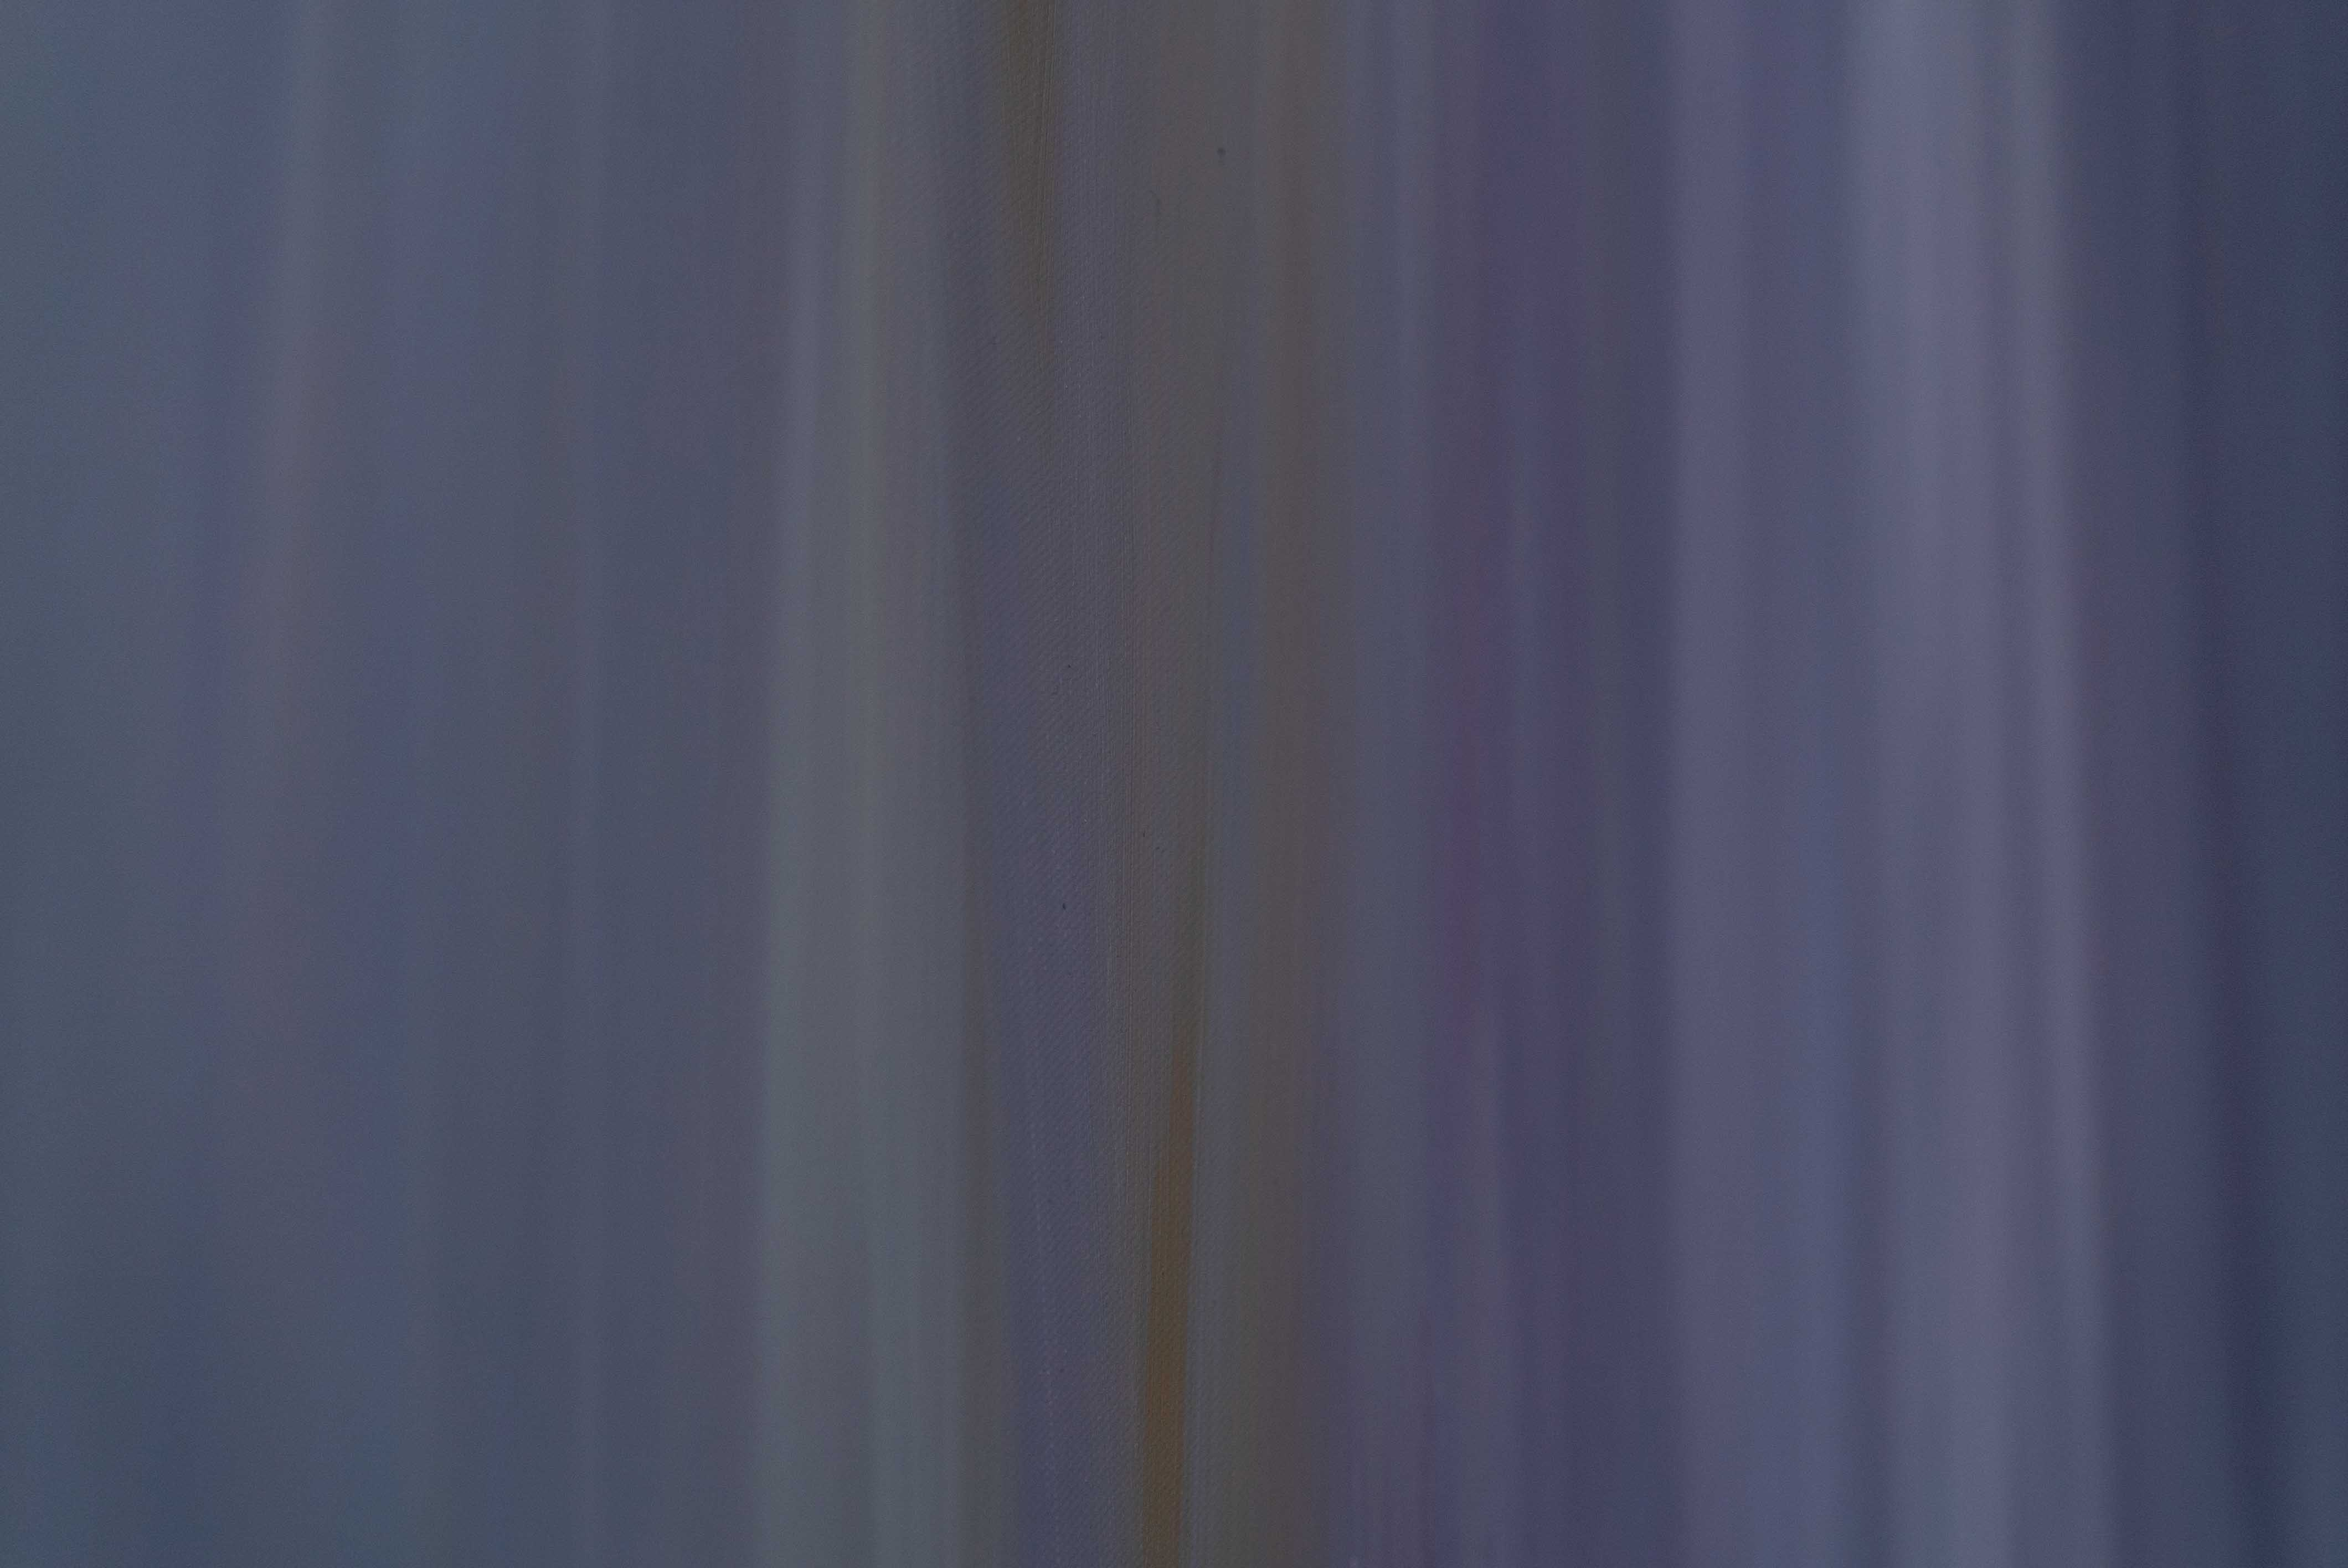 britta-kramer-891